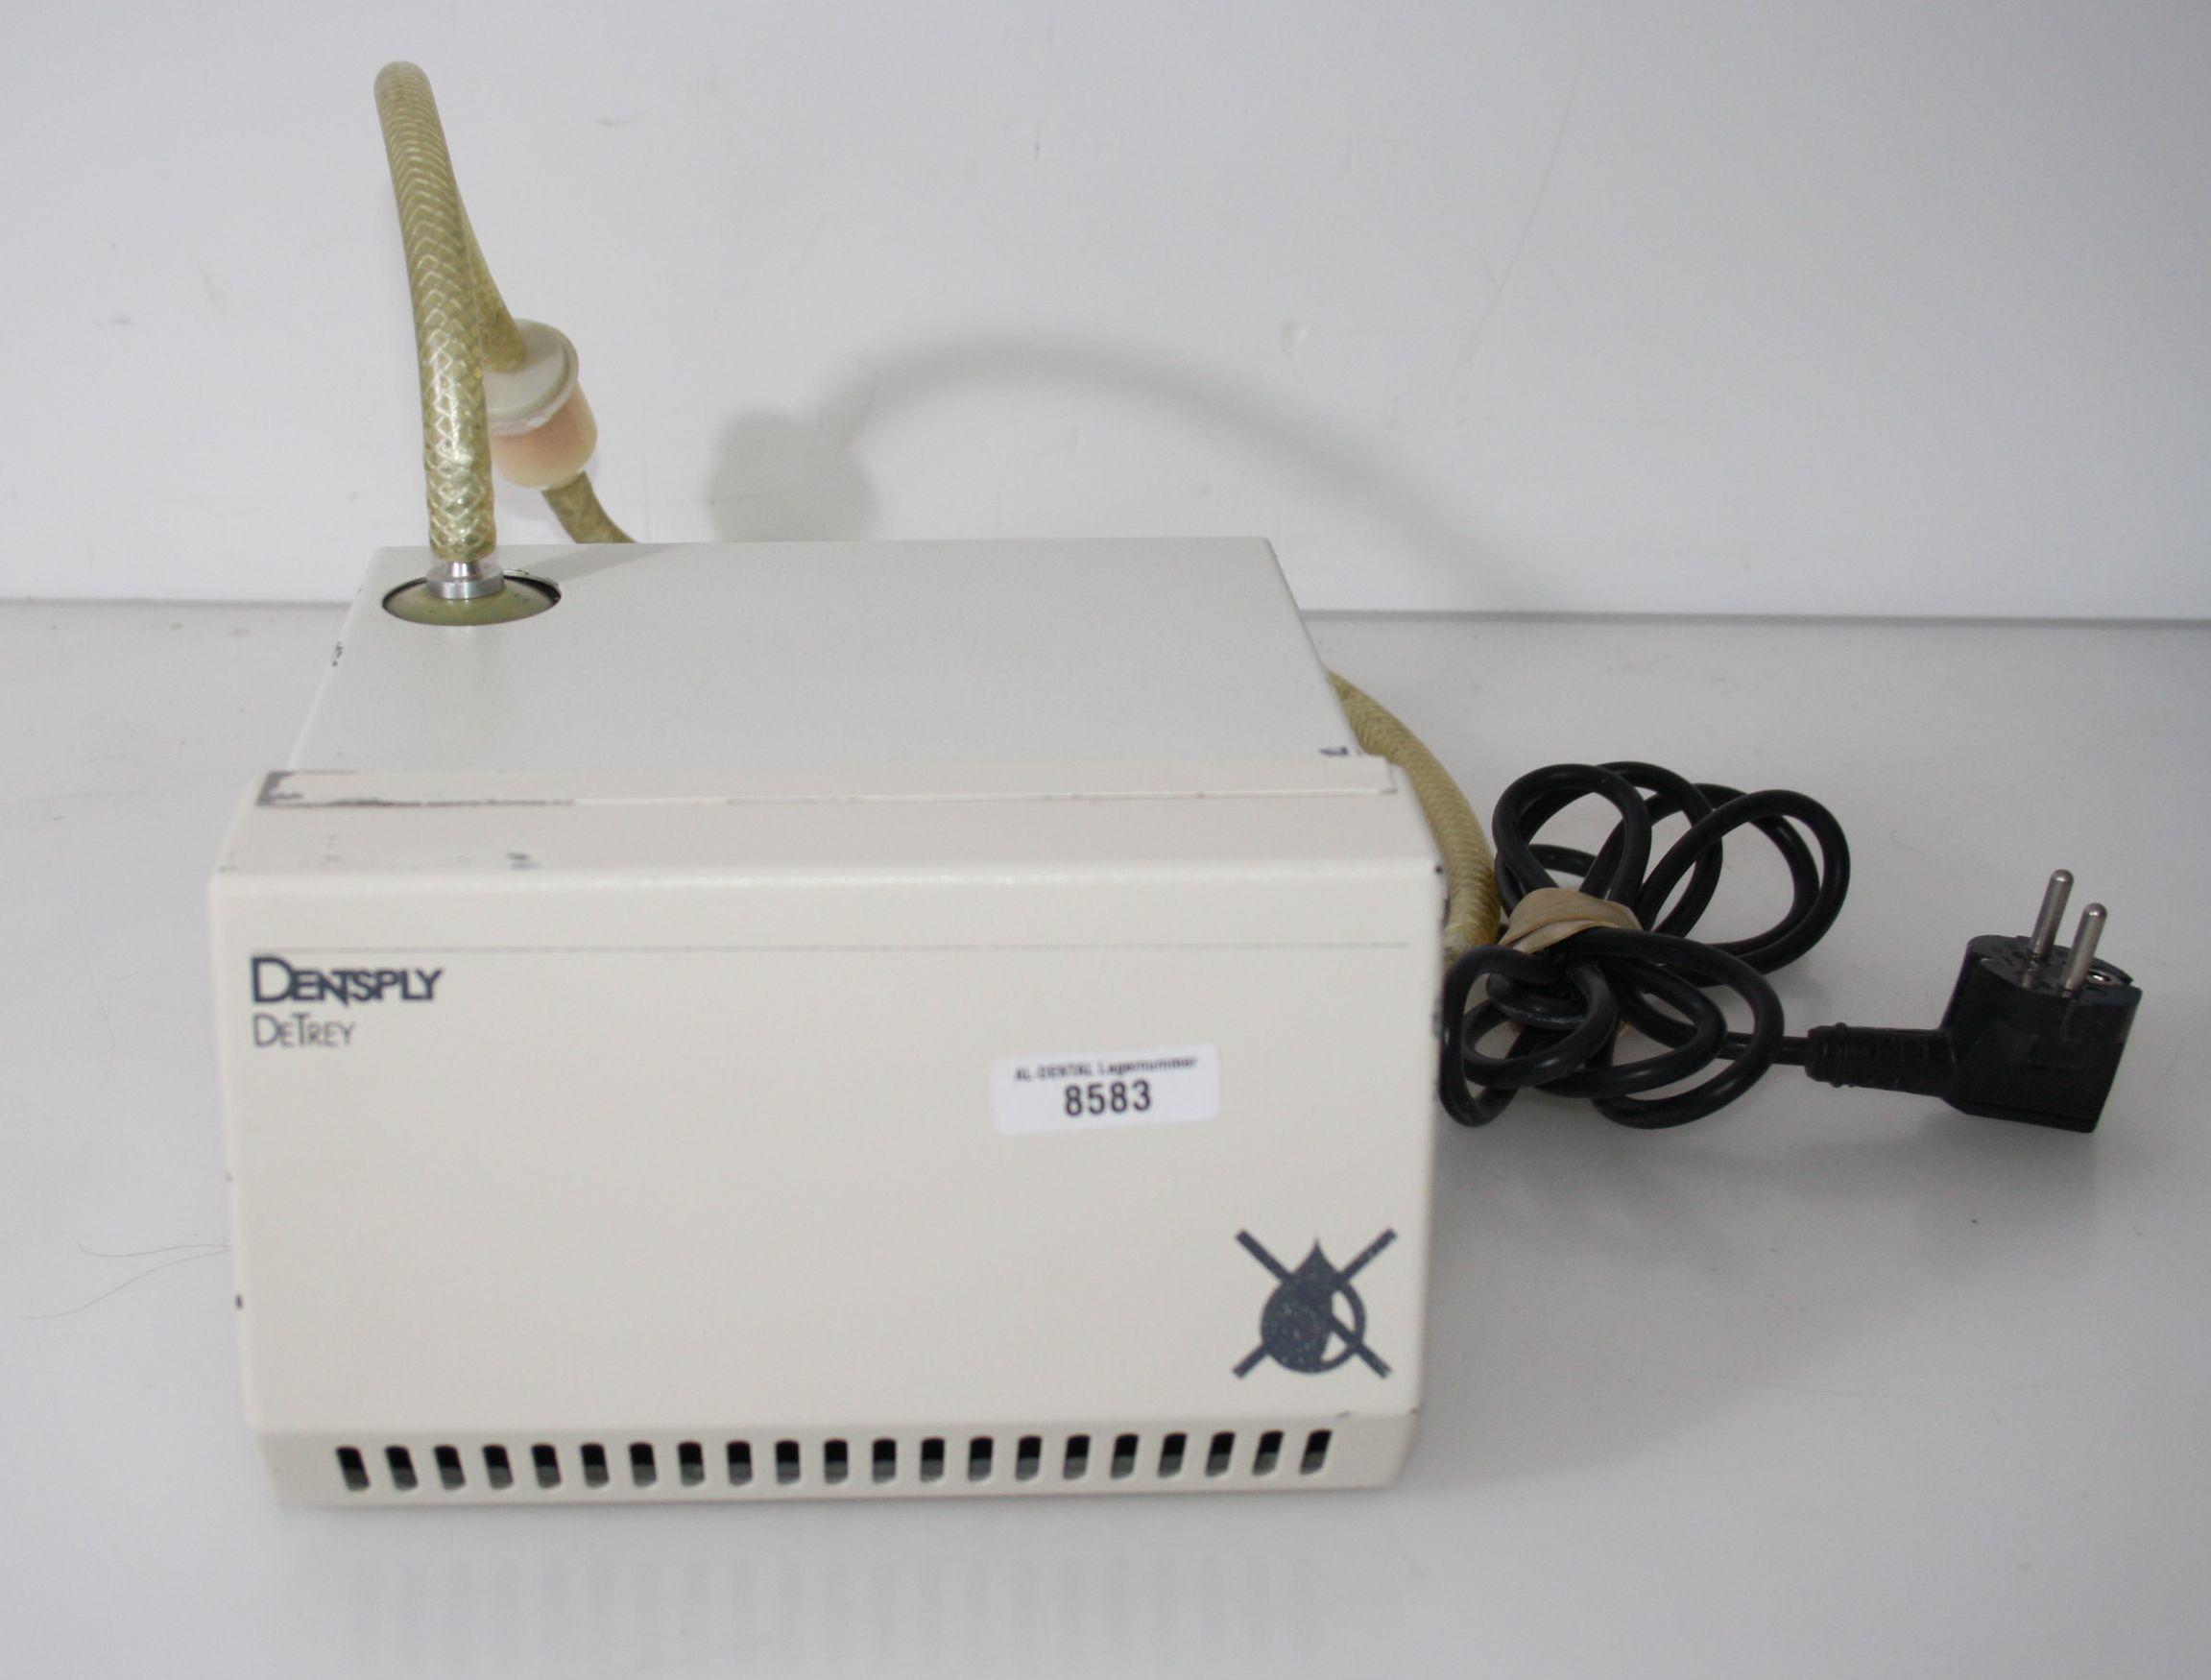 Vakuumpumpe für Keramiköfen-Öfen DeTrey OF # 8583